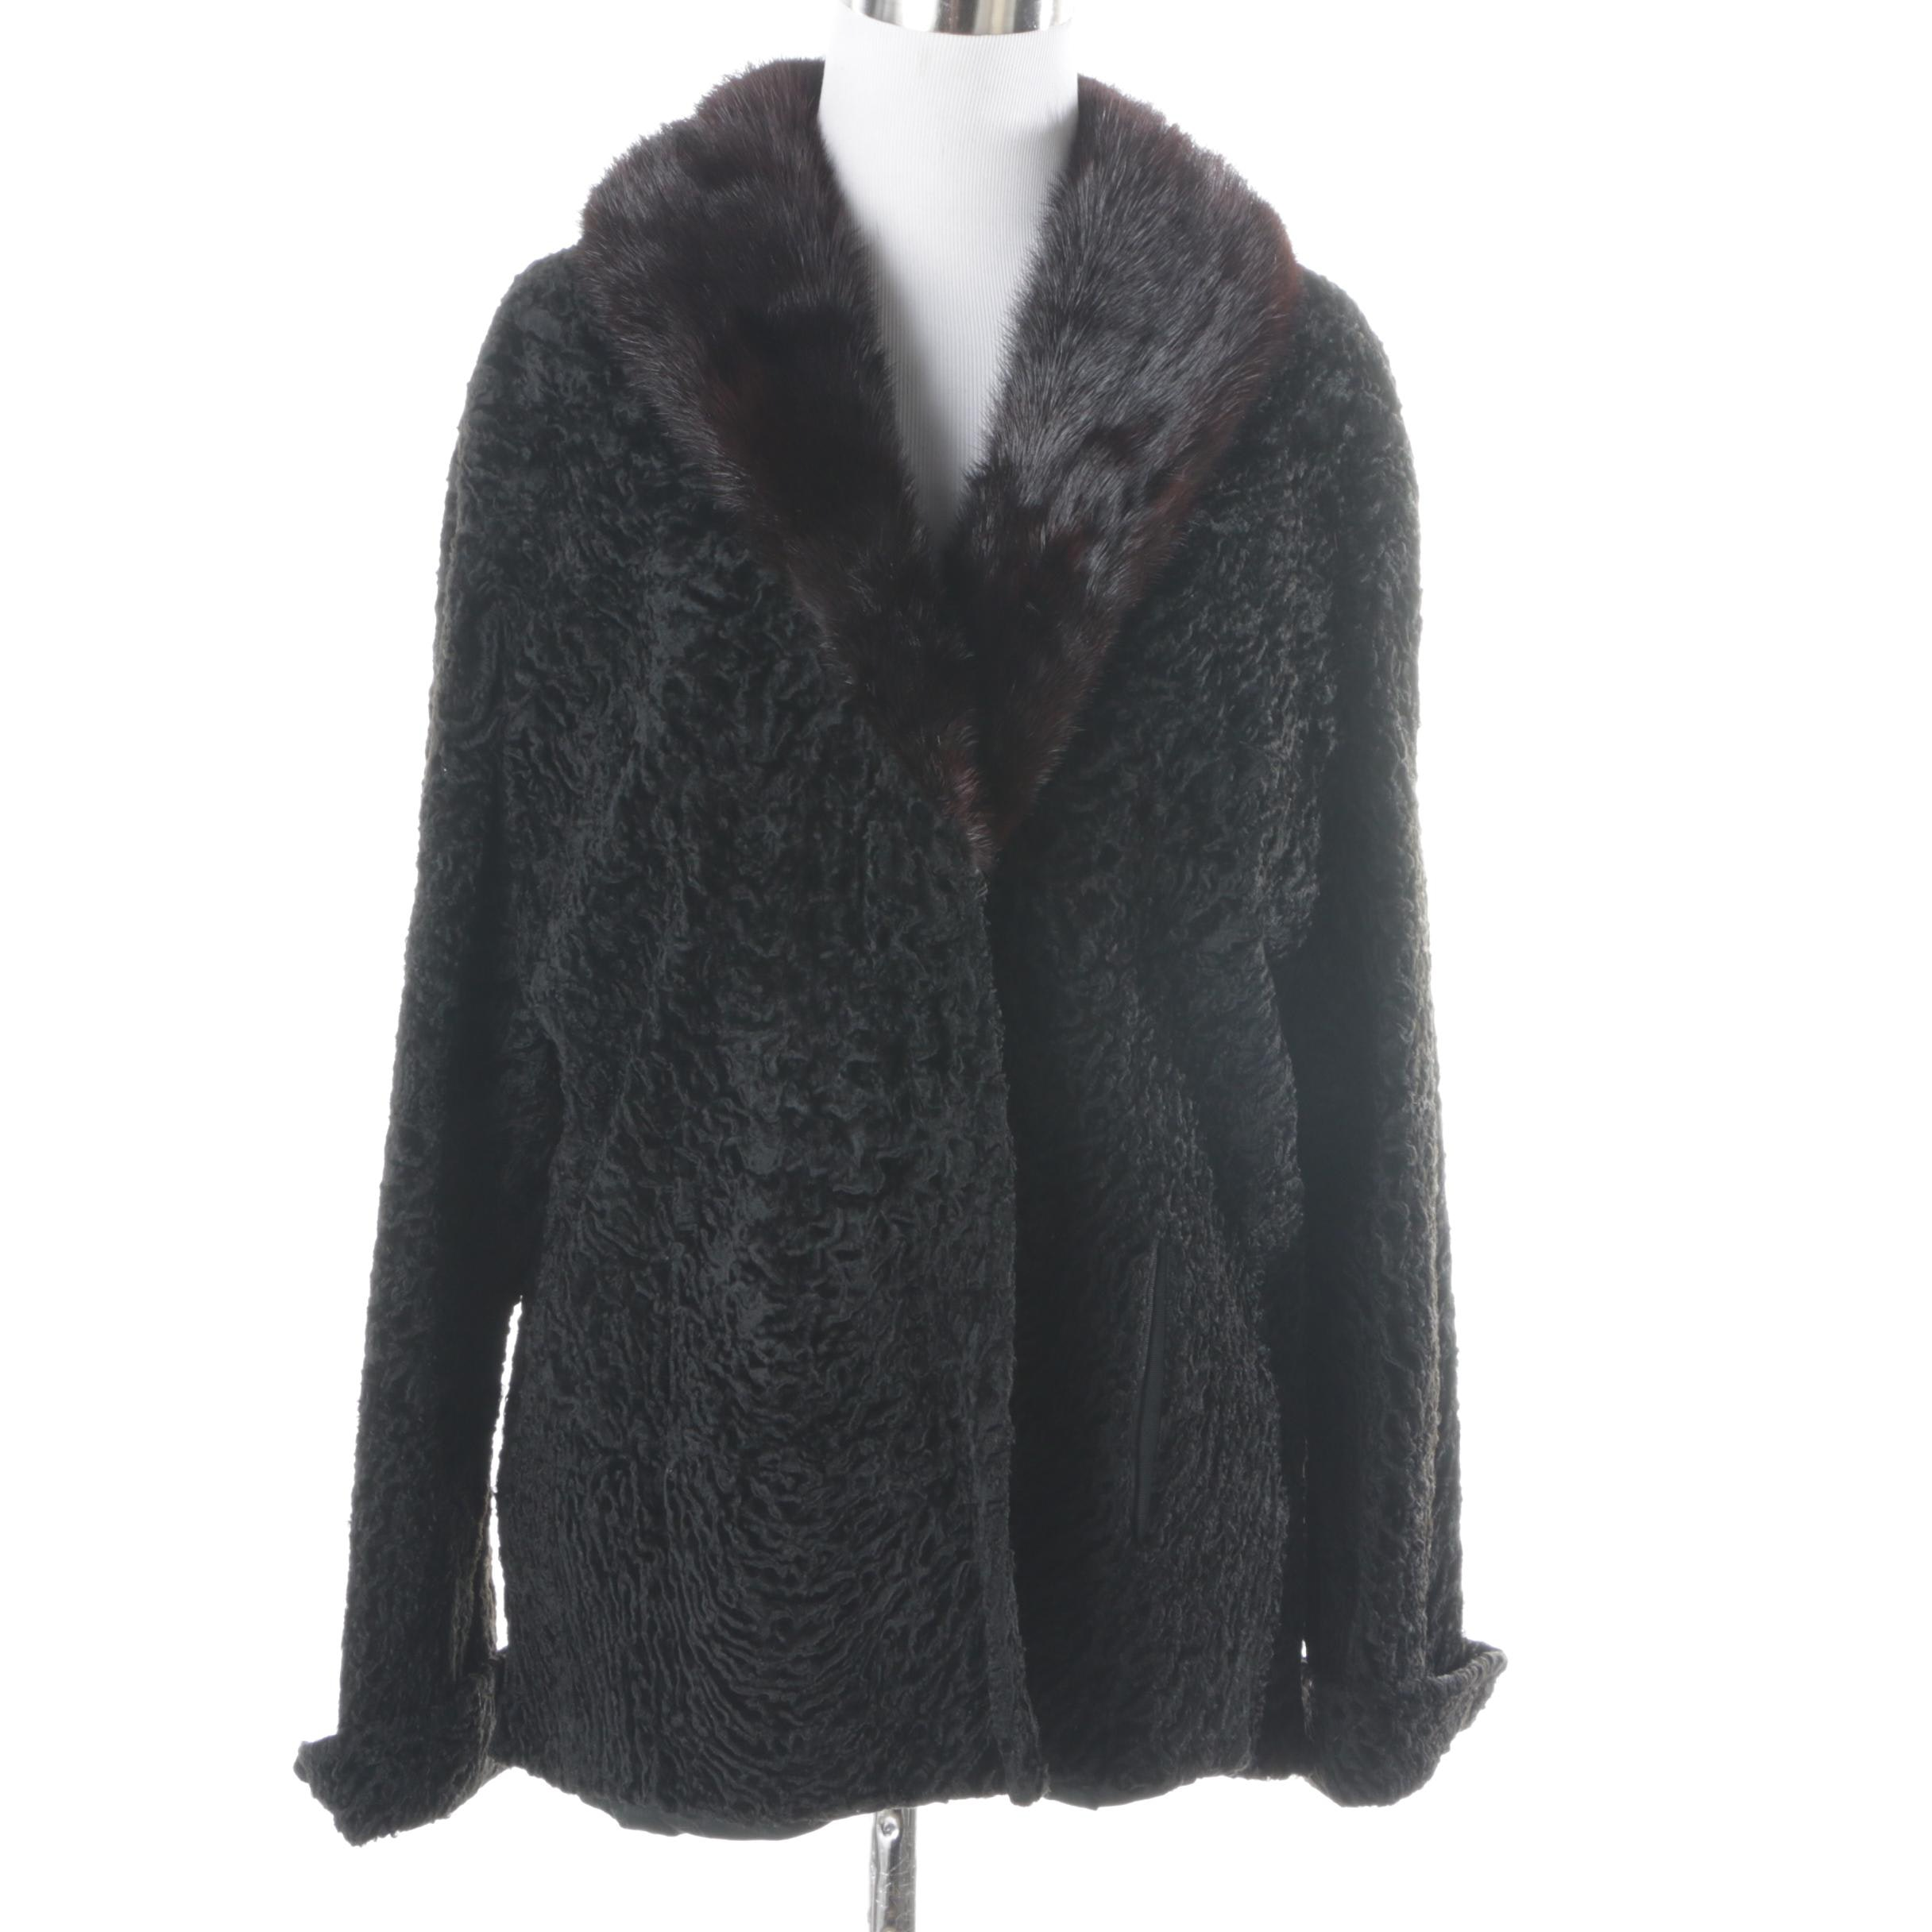 Persian Lamb Coat with Mink Fur Collar